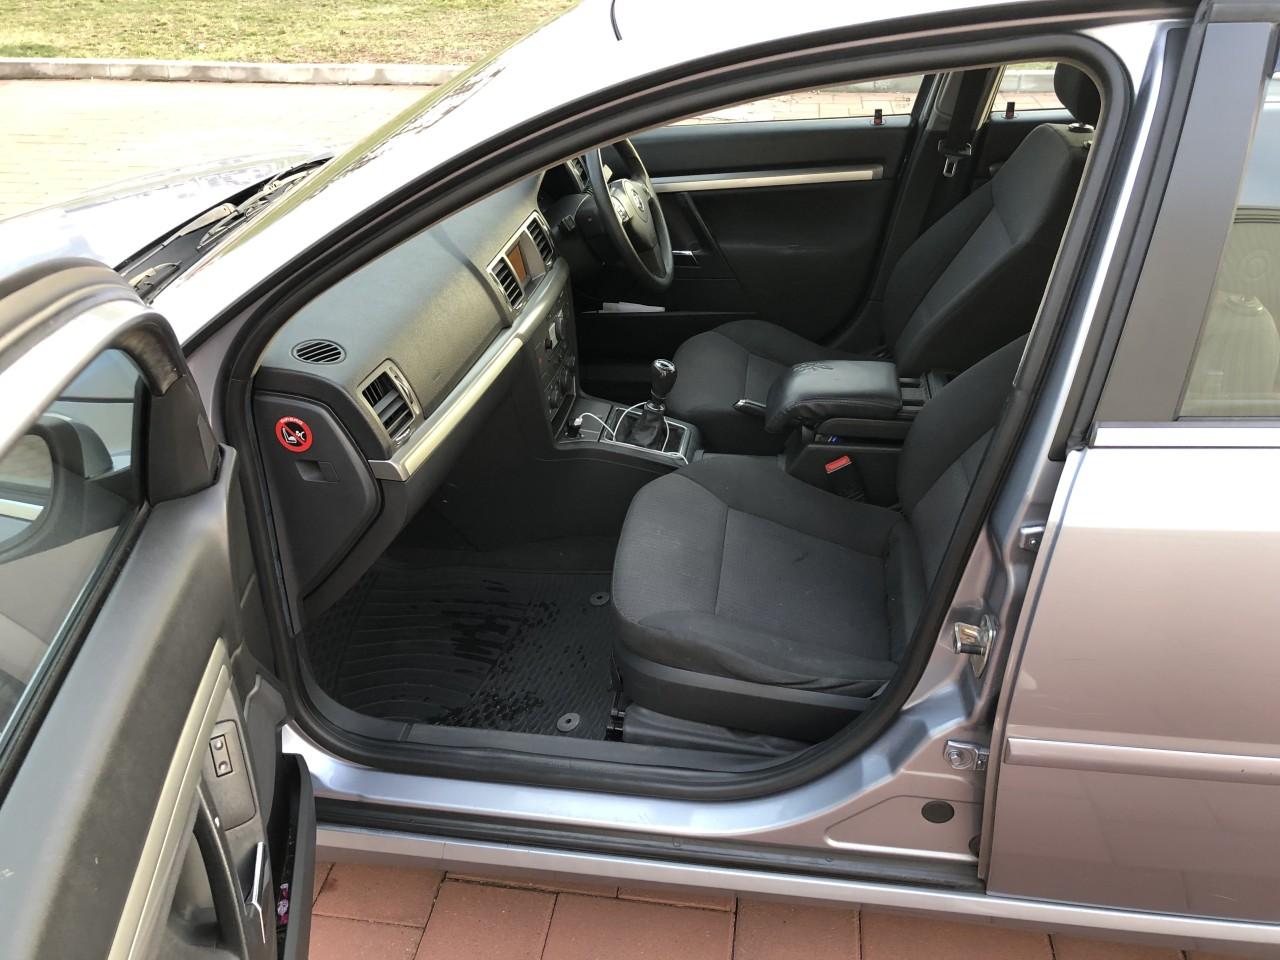 Opel Vectra 1.9 cdti 2009